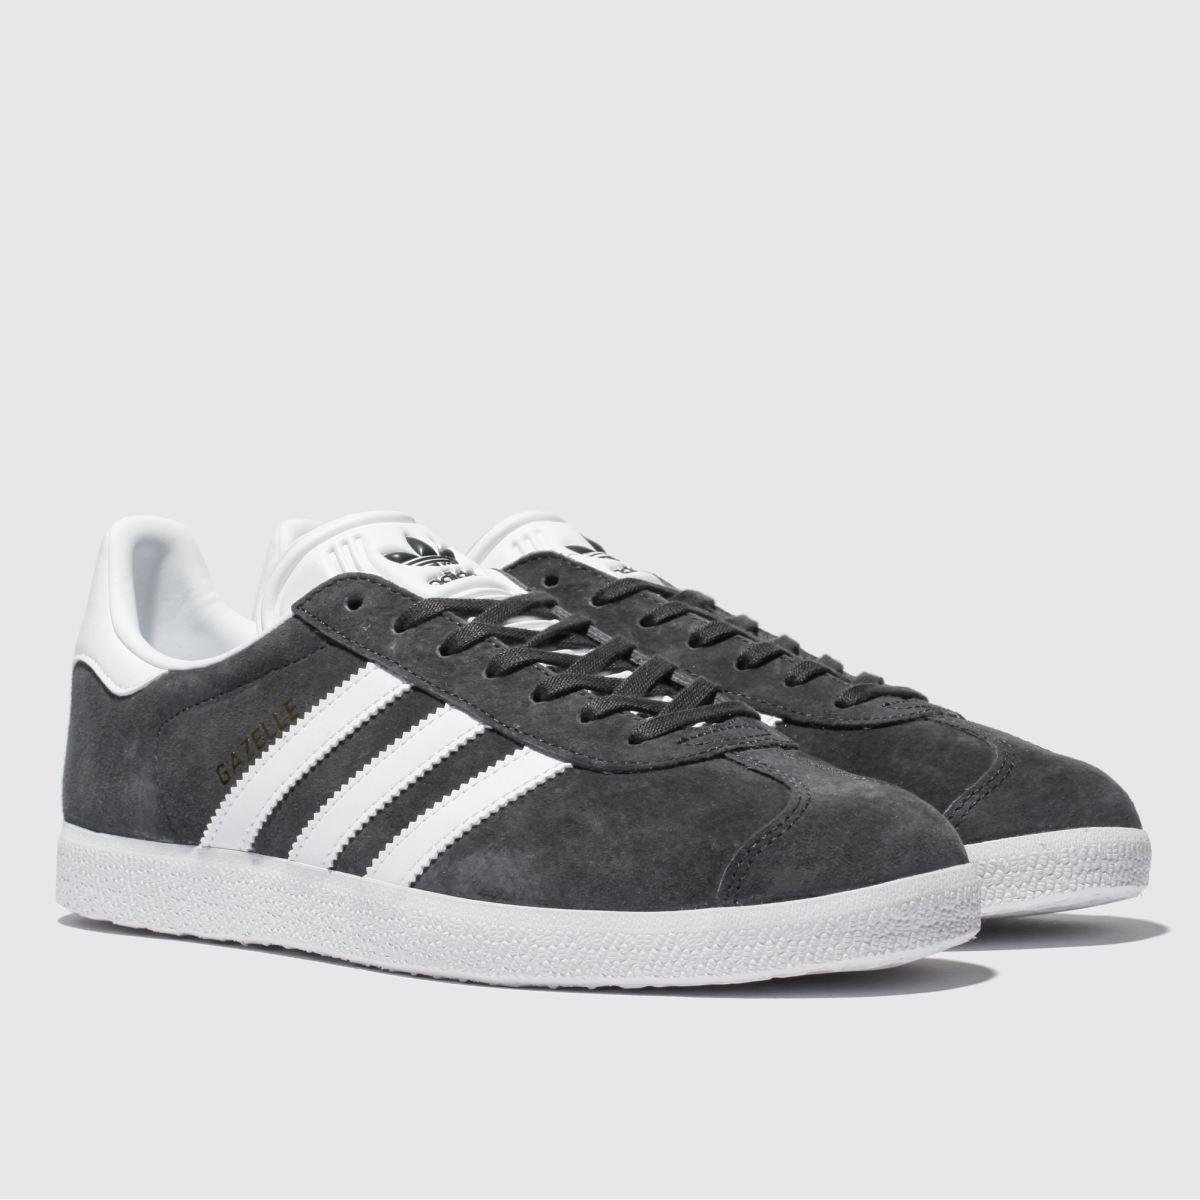 Herren Dunkelgrau adidas Gazelle Sneaker   schuh Gute Qualität beliebte Schuhe